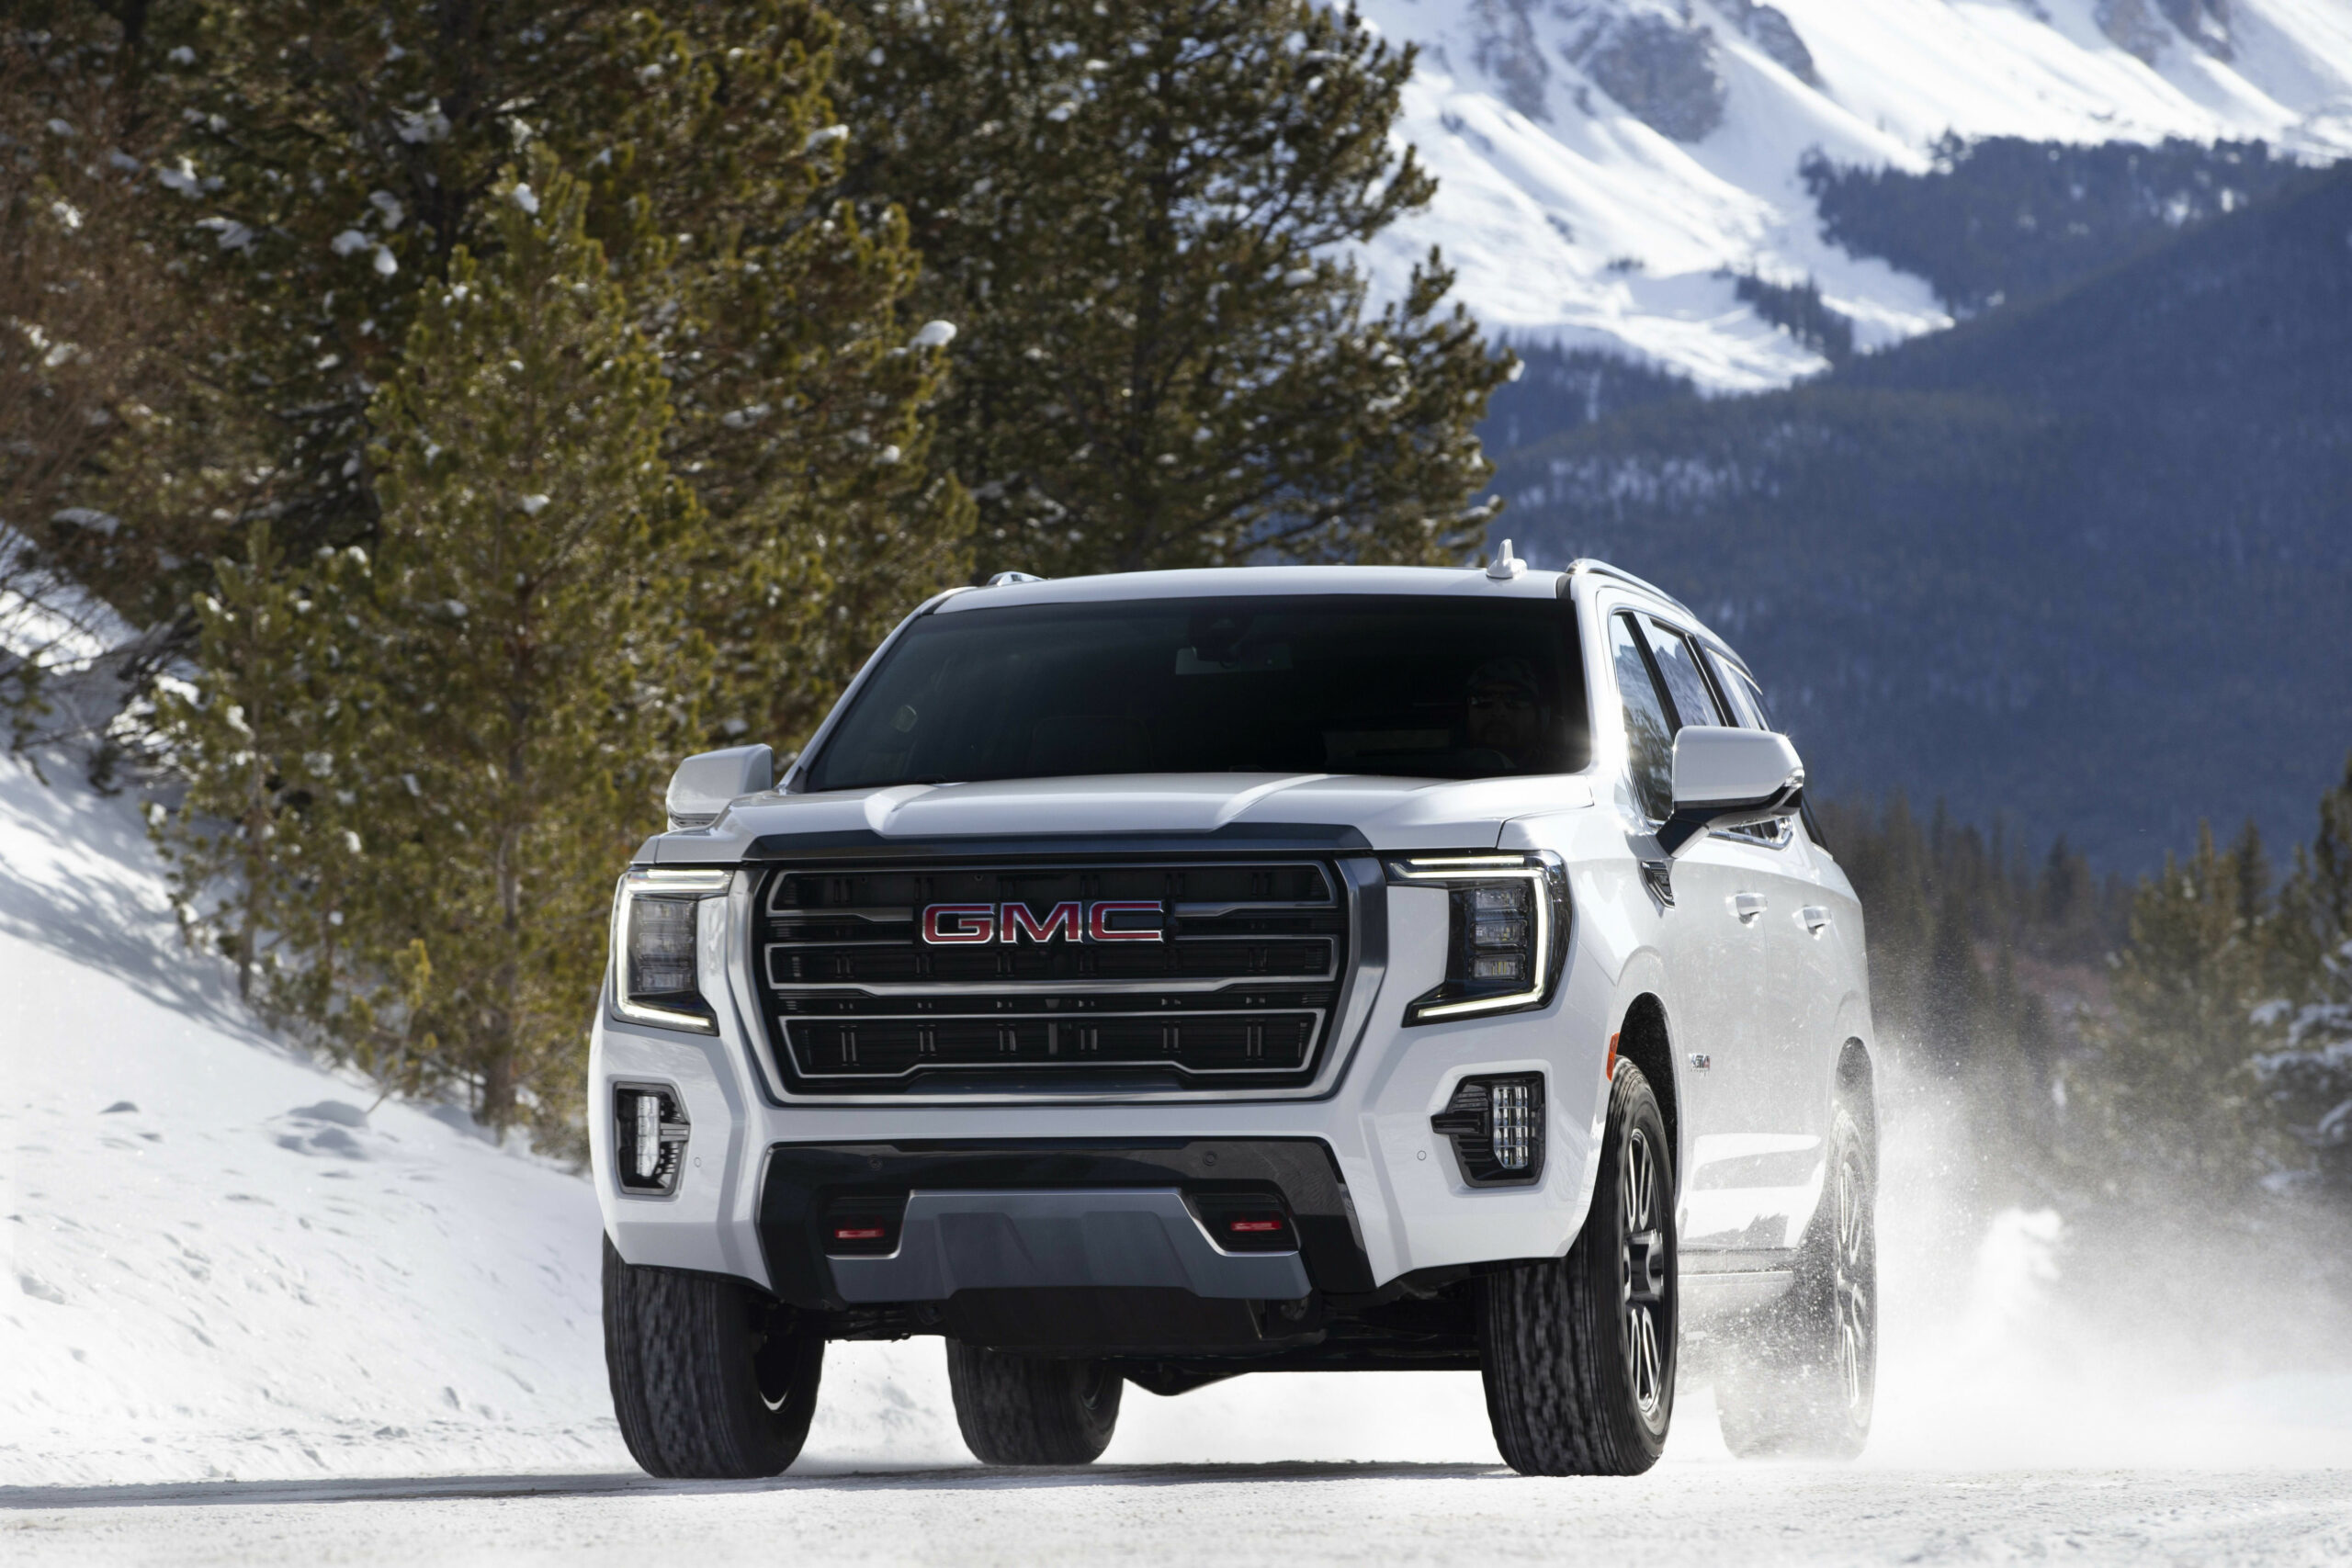 Performance Gmc Yukon 2022 Release Date